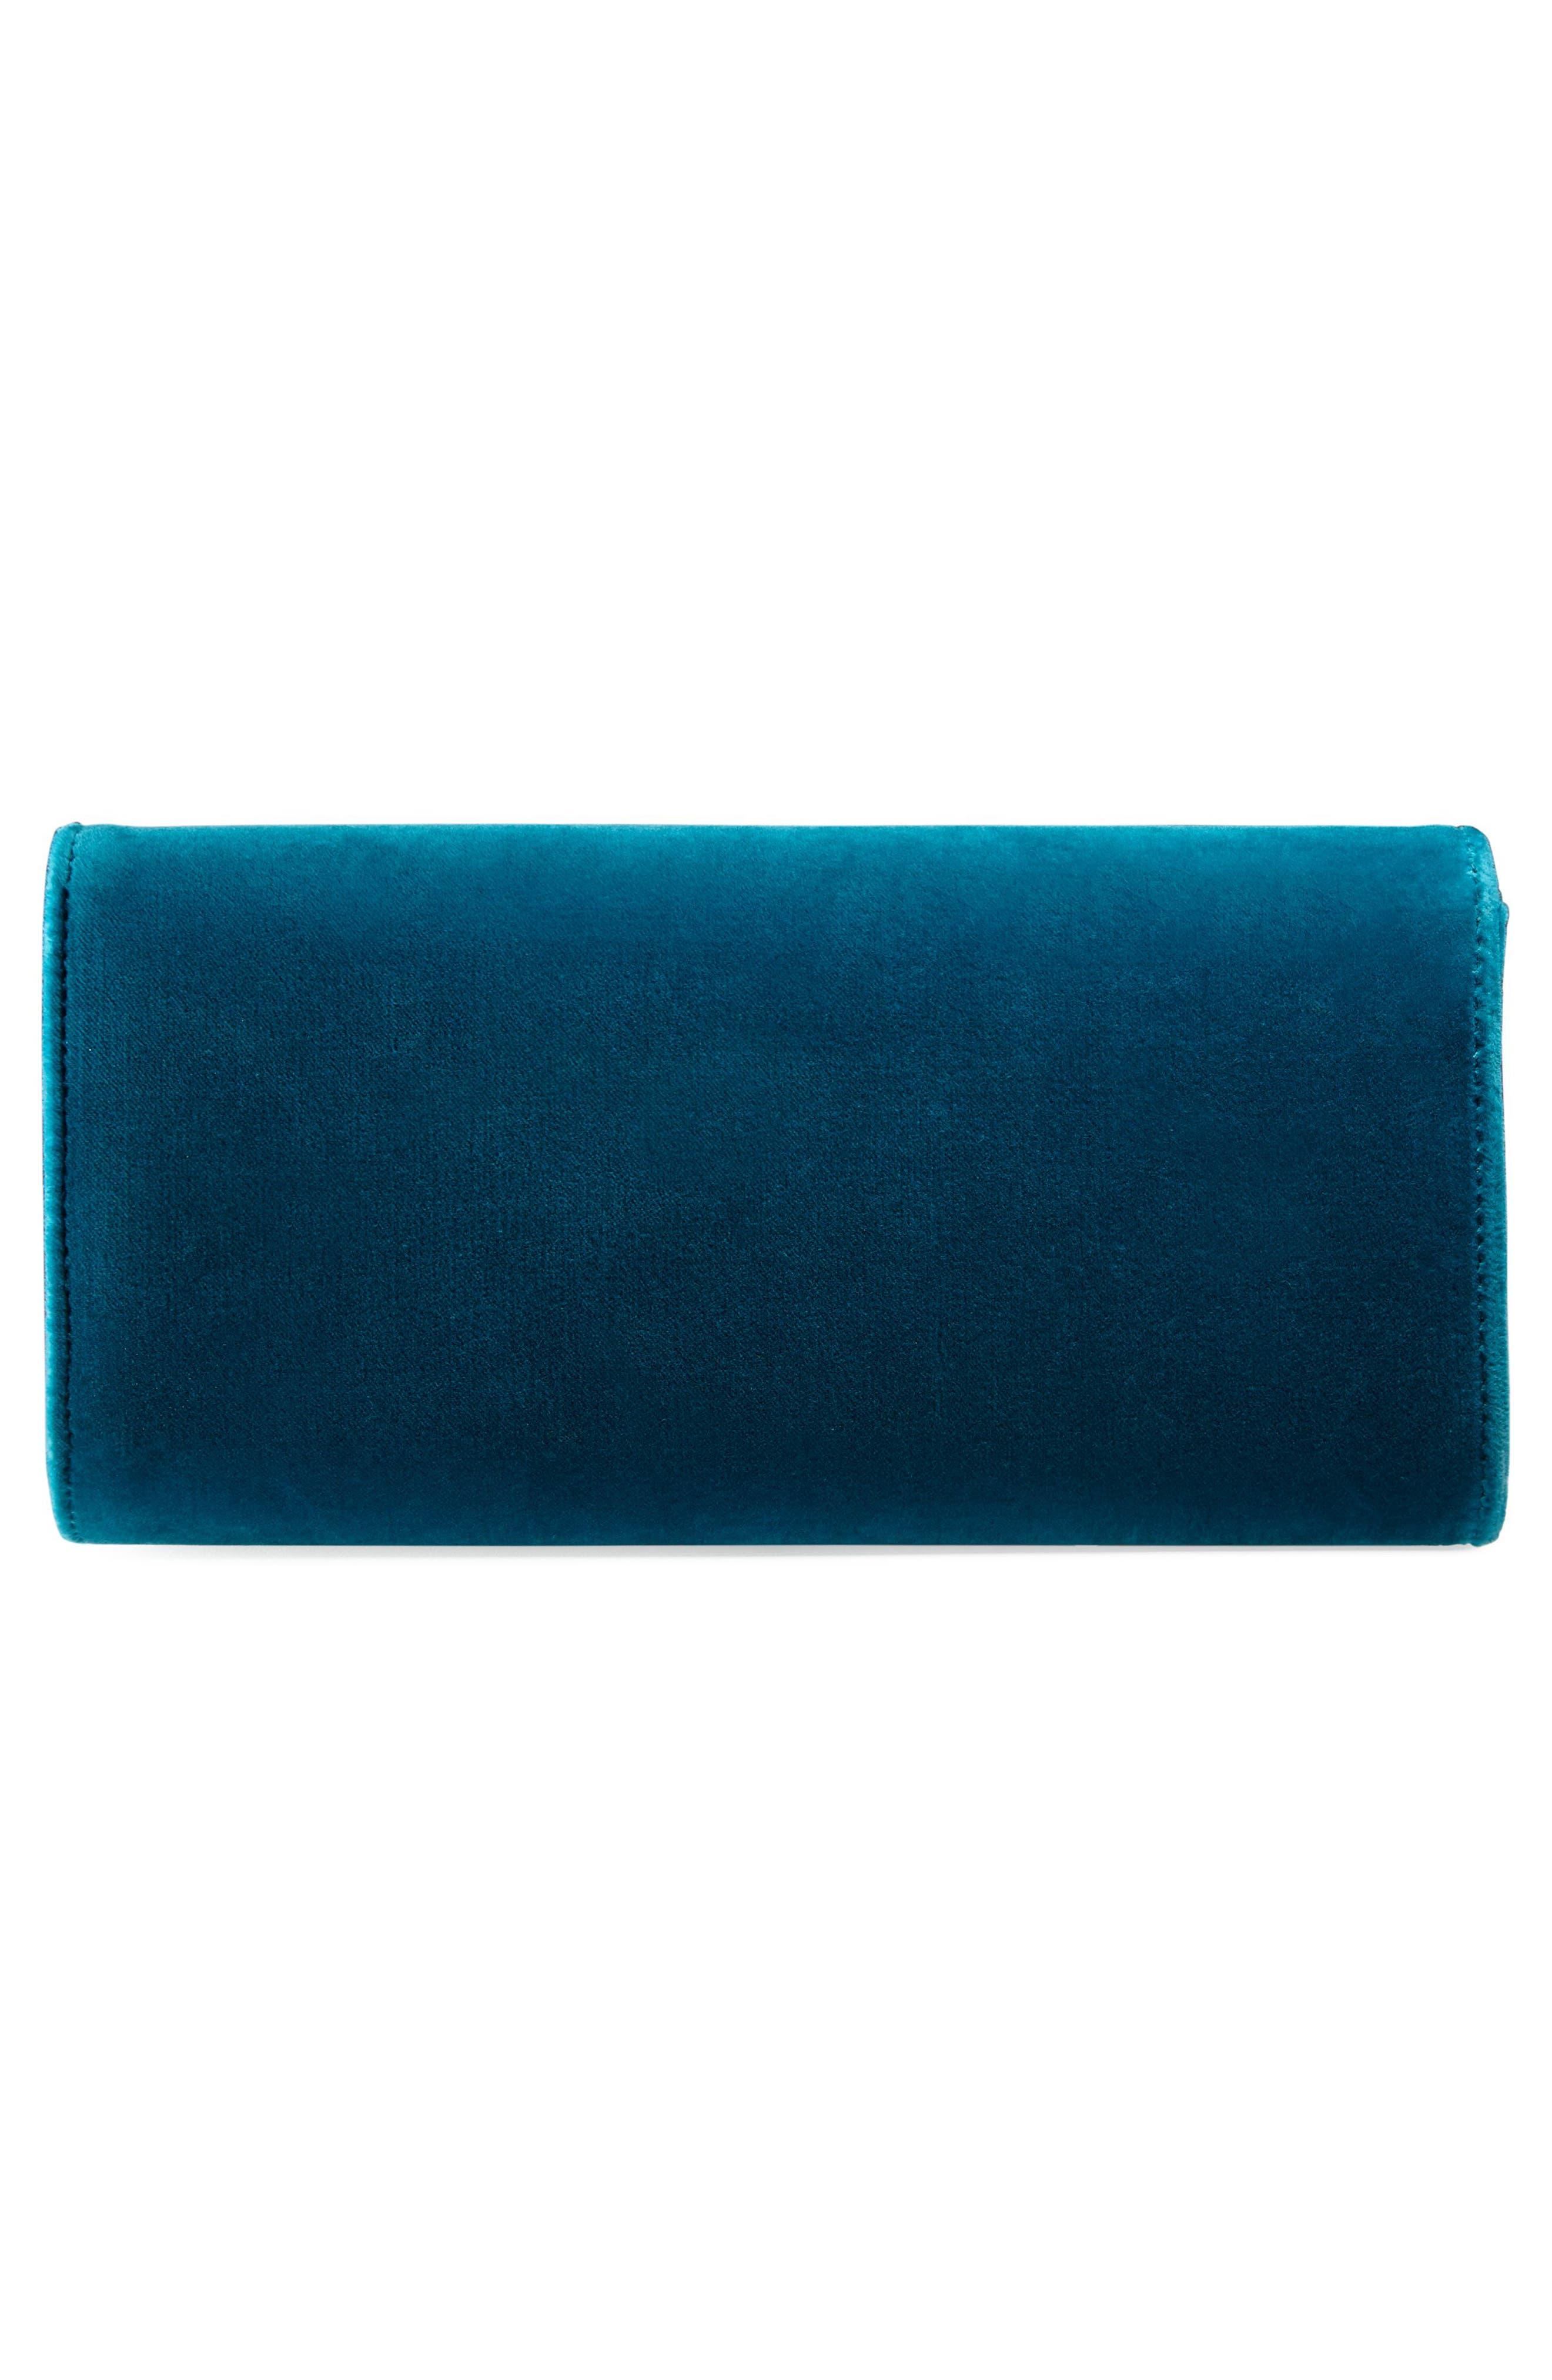 d1240f18d82d Shop Gucci Dionysus Velvet Clutch - Blue In Pivone Blk Diamond